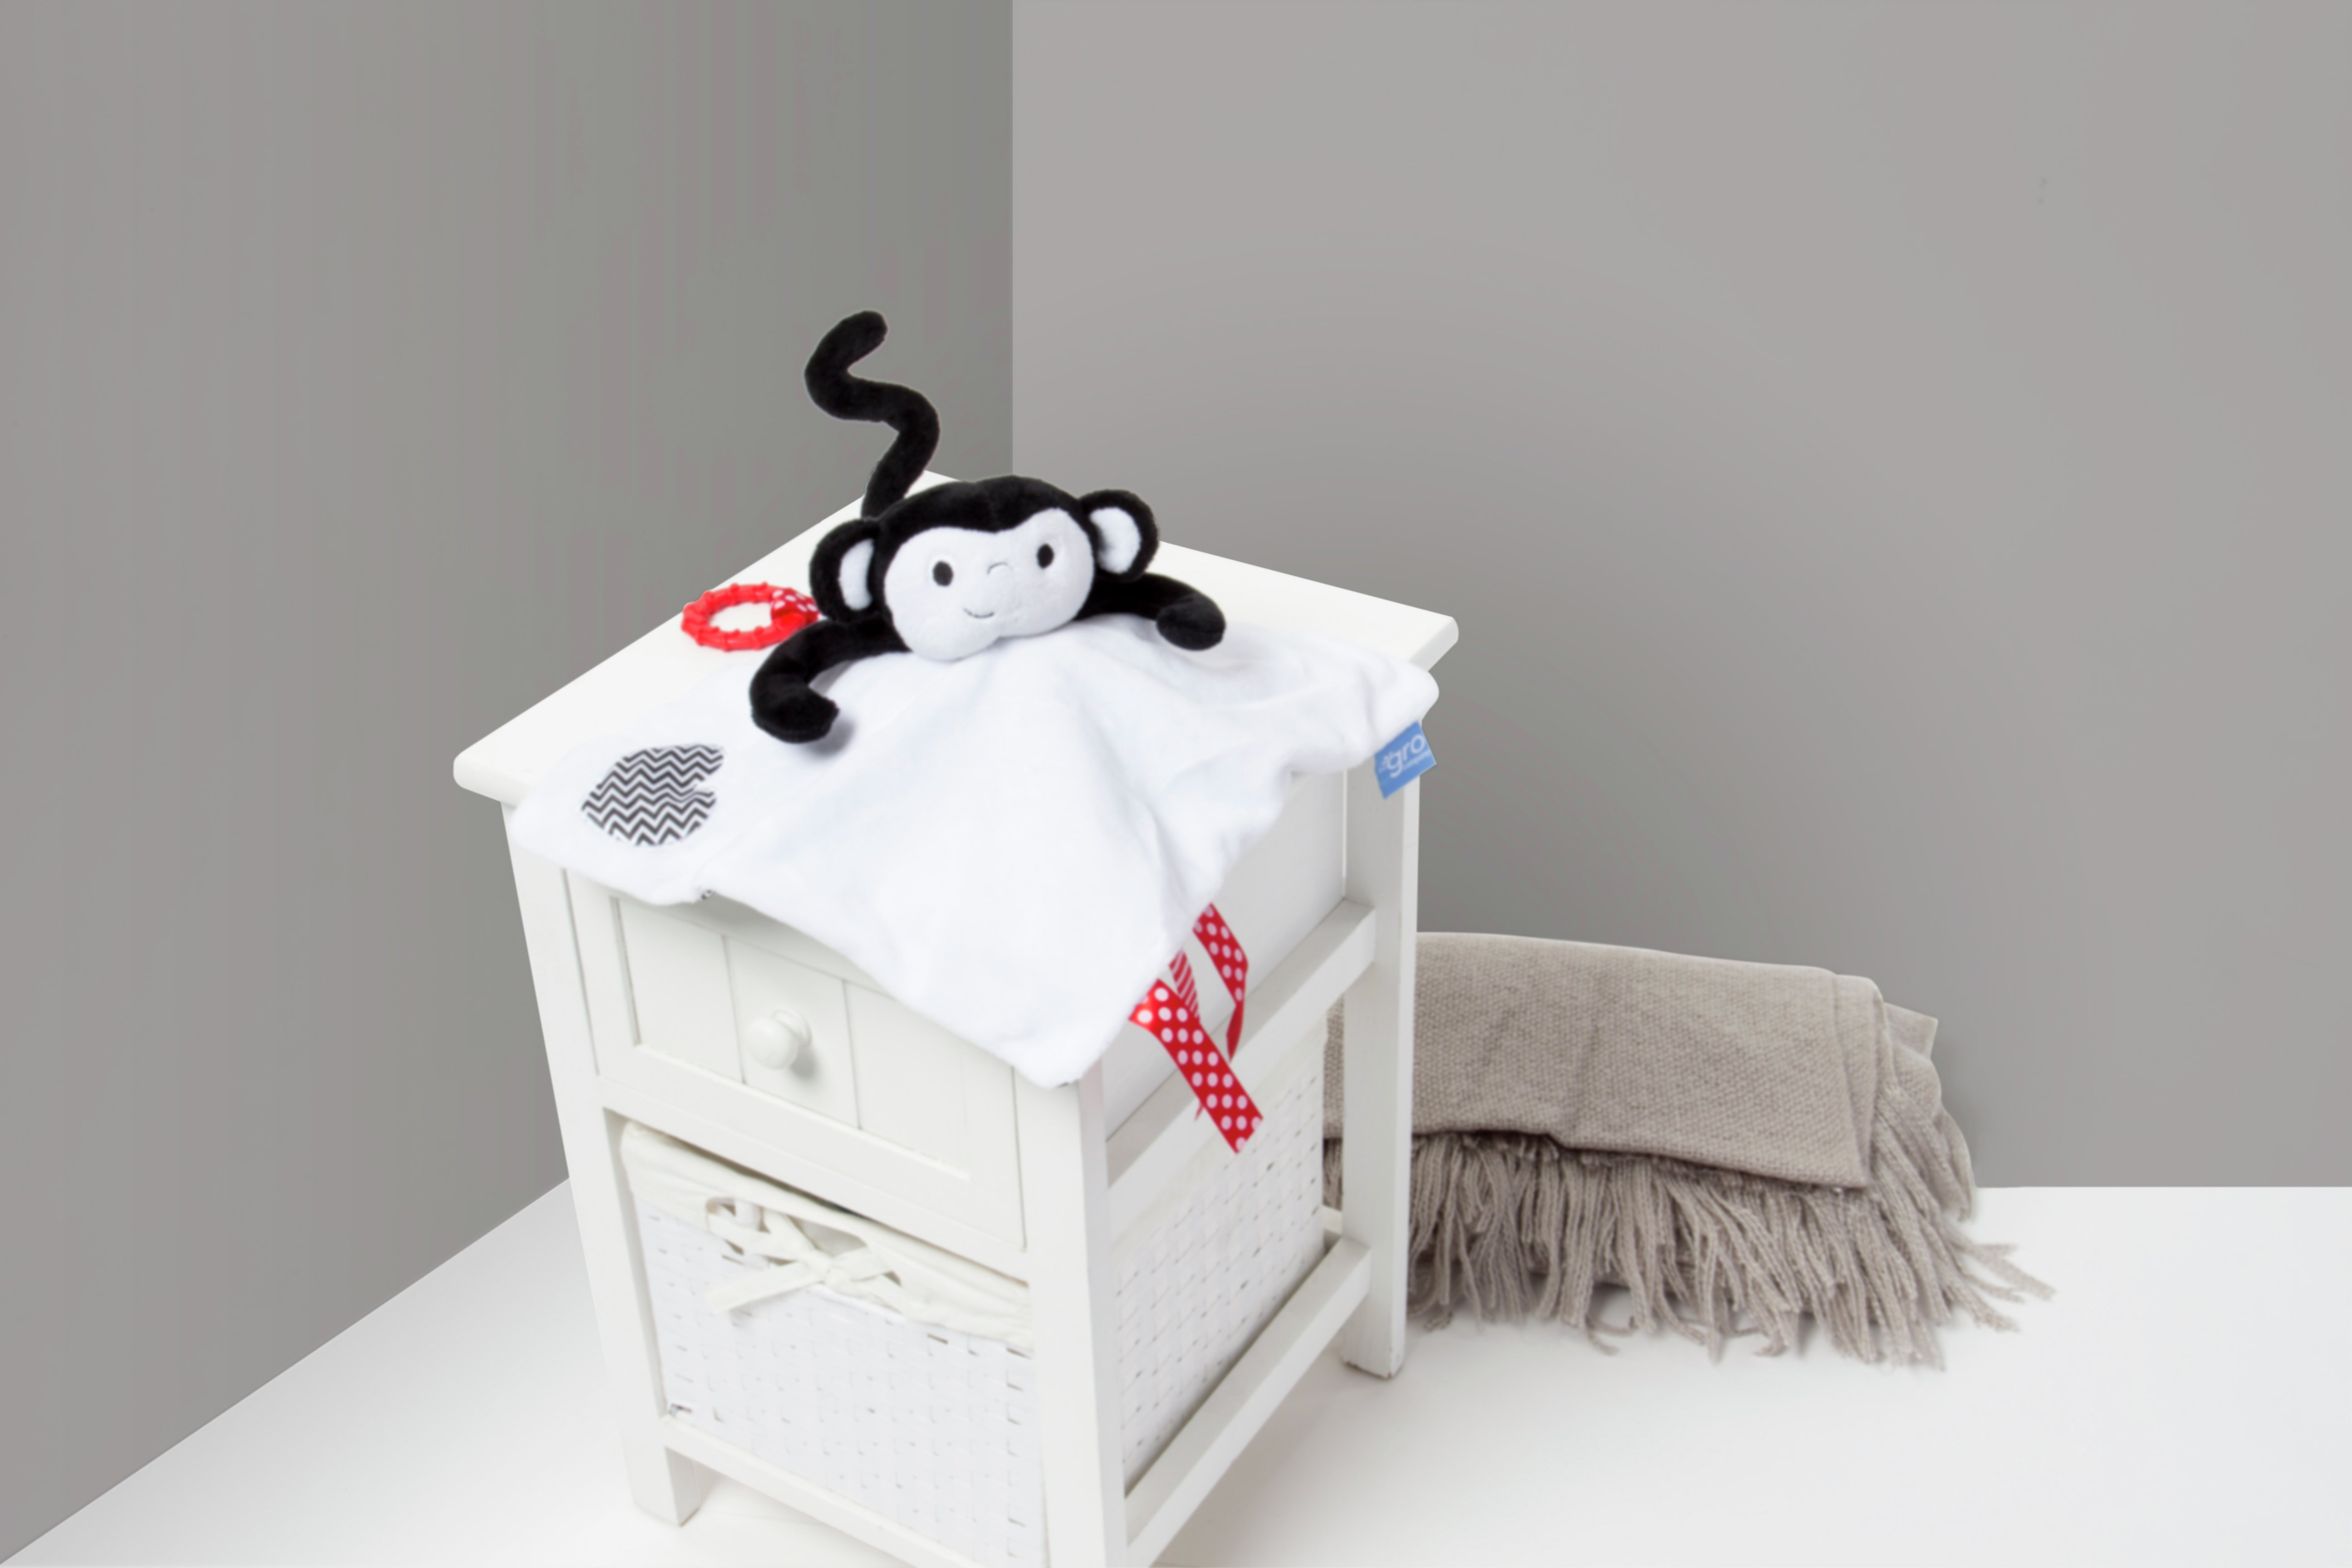 gro comforter morris monkey.